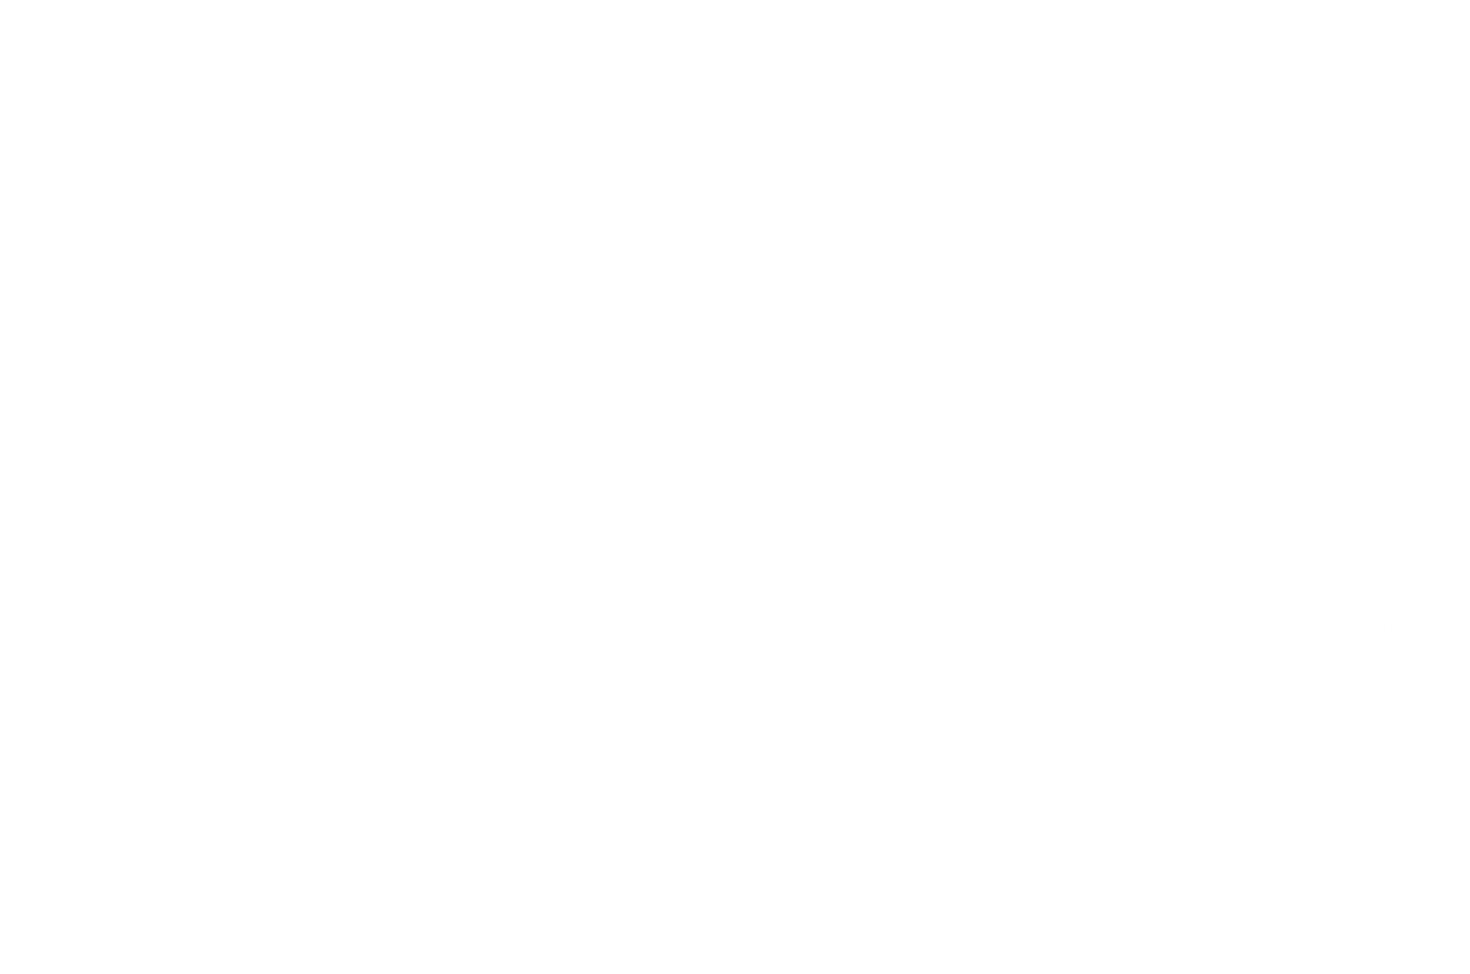 Logo of The Thomas Lord - Upham Pub Co.